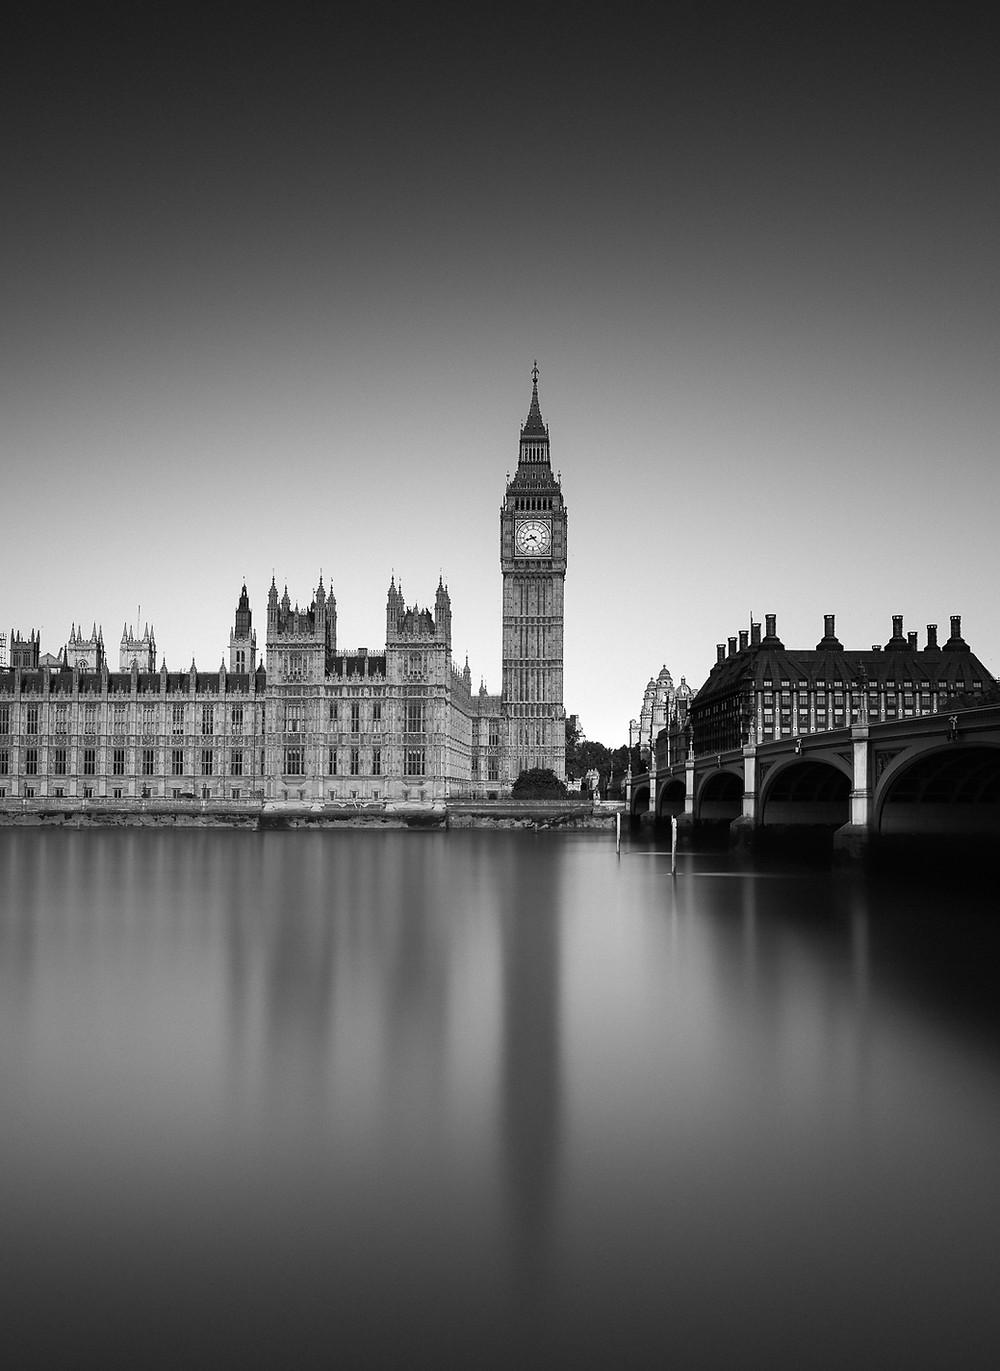 fine art photography workshop london